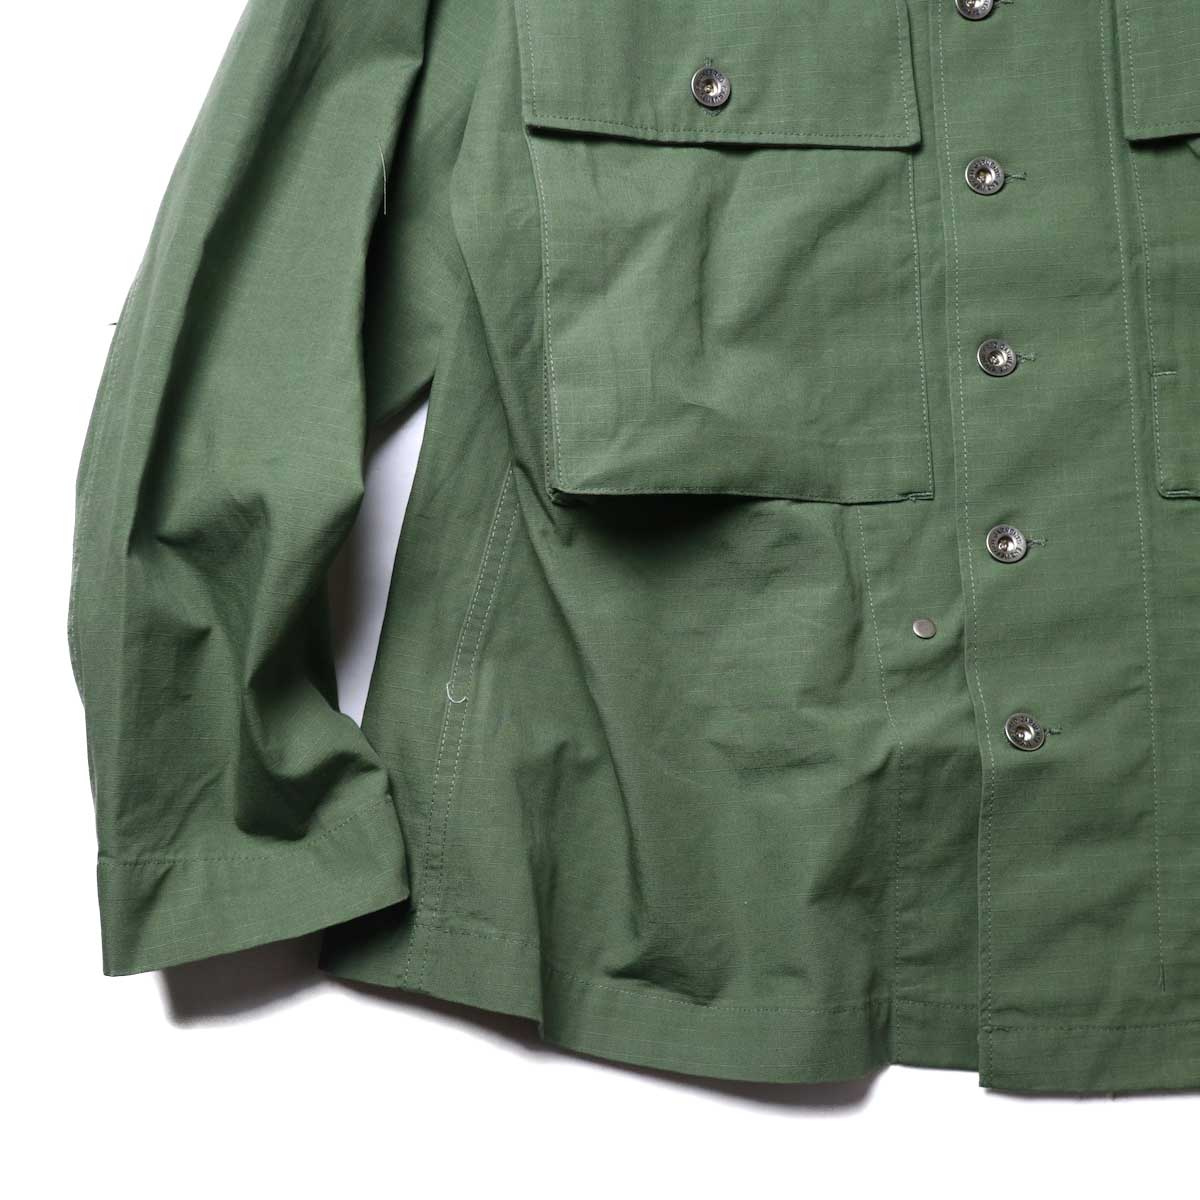 Engineered Garments / M43/2 Shirt Jacket -Cotton Ripstop (Olive)裾、袖